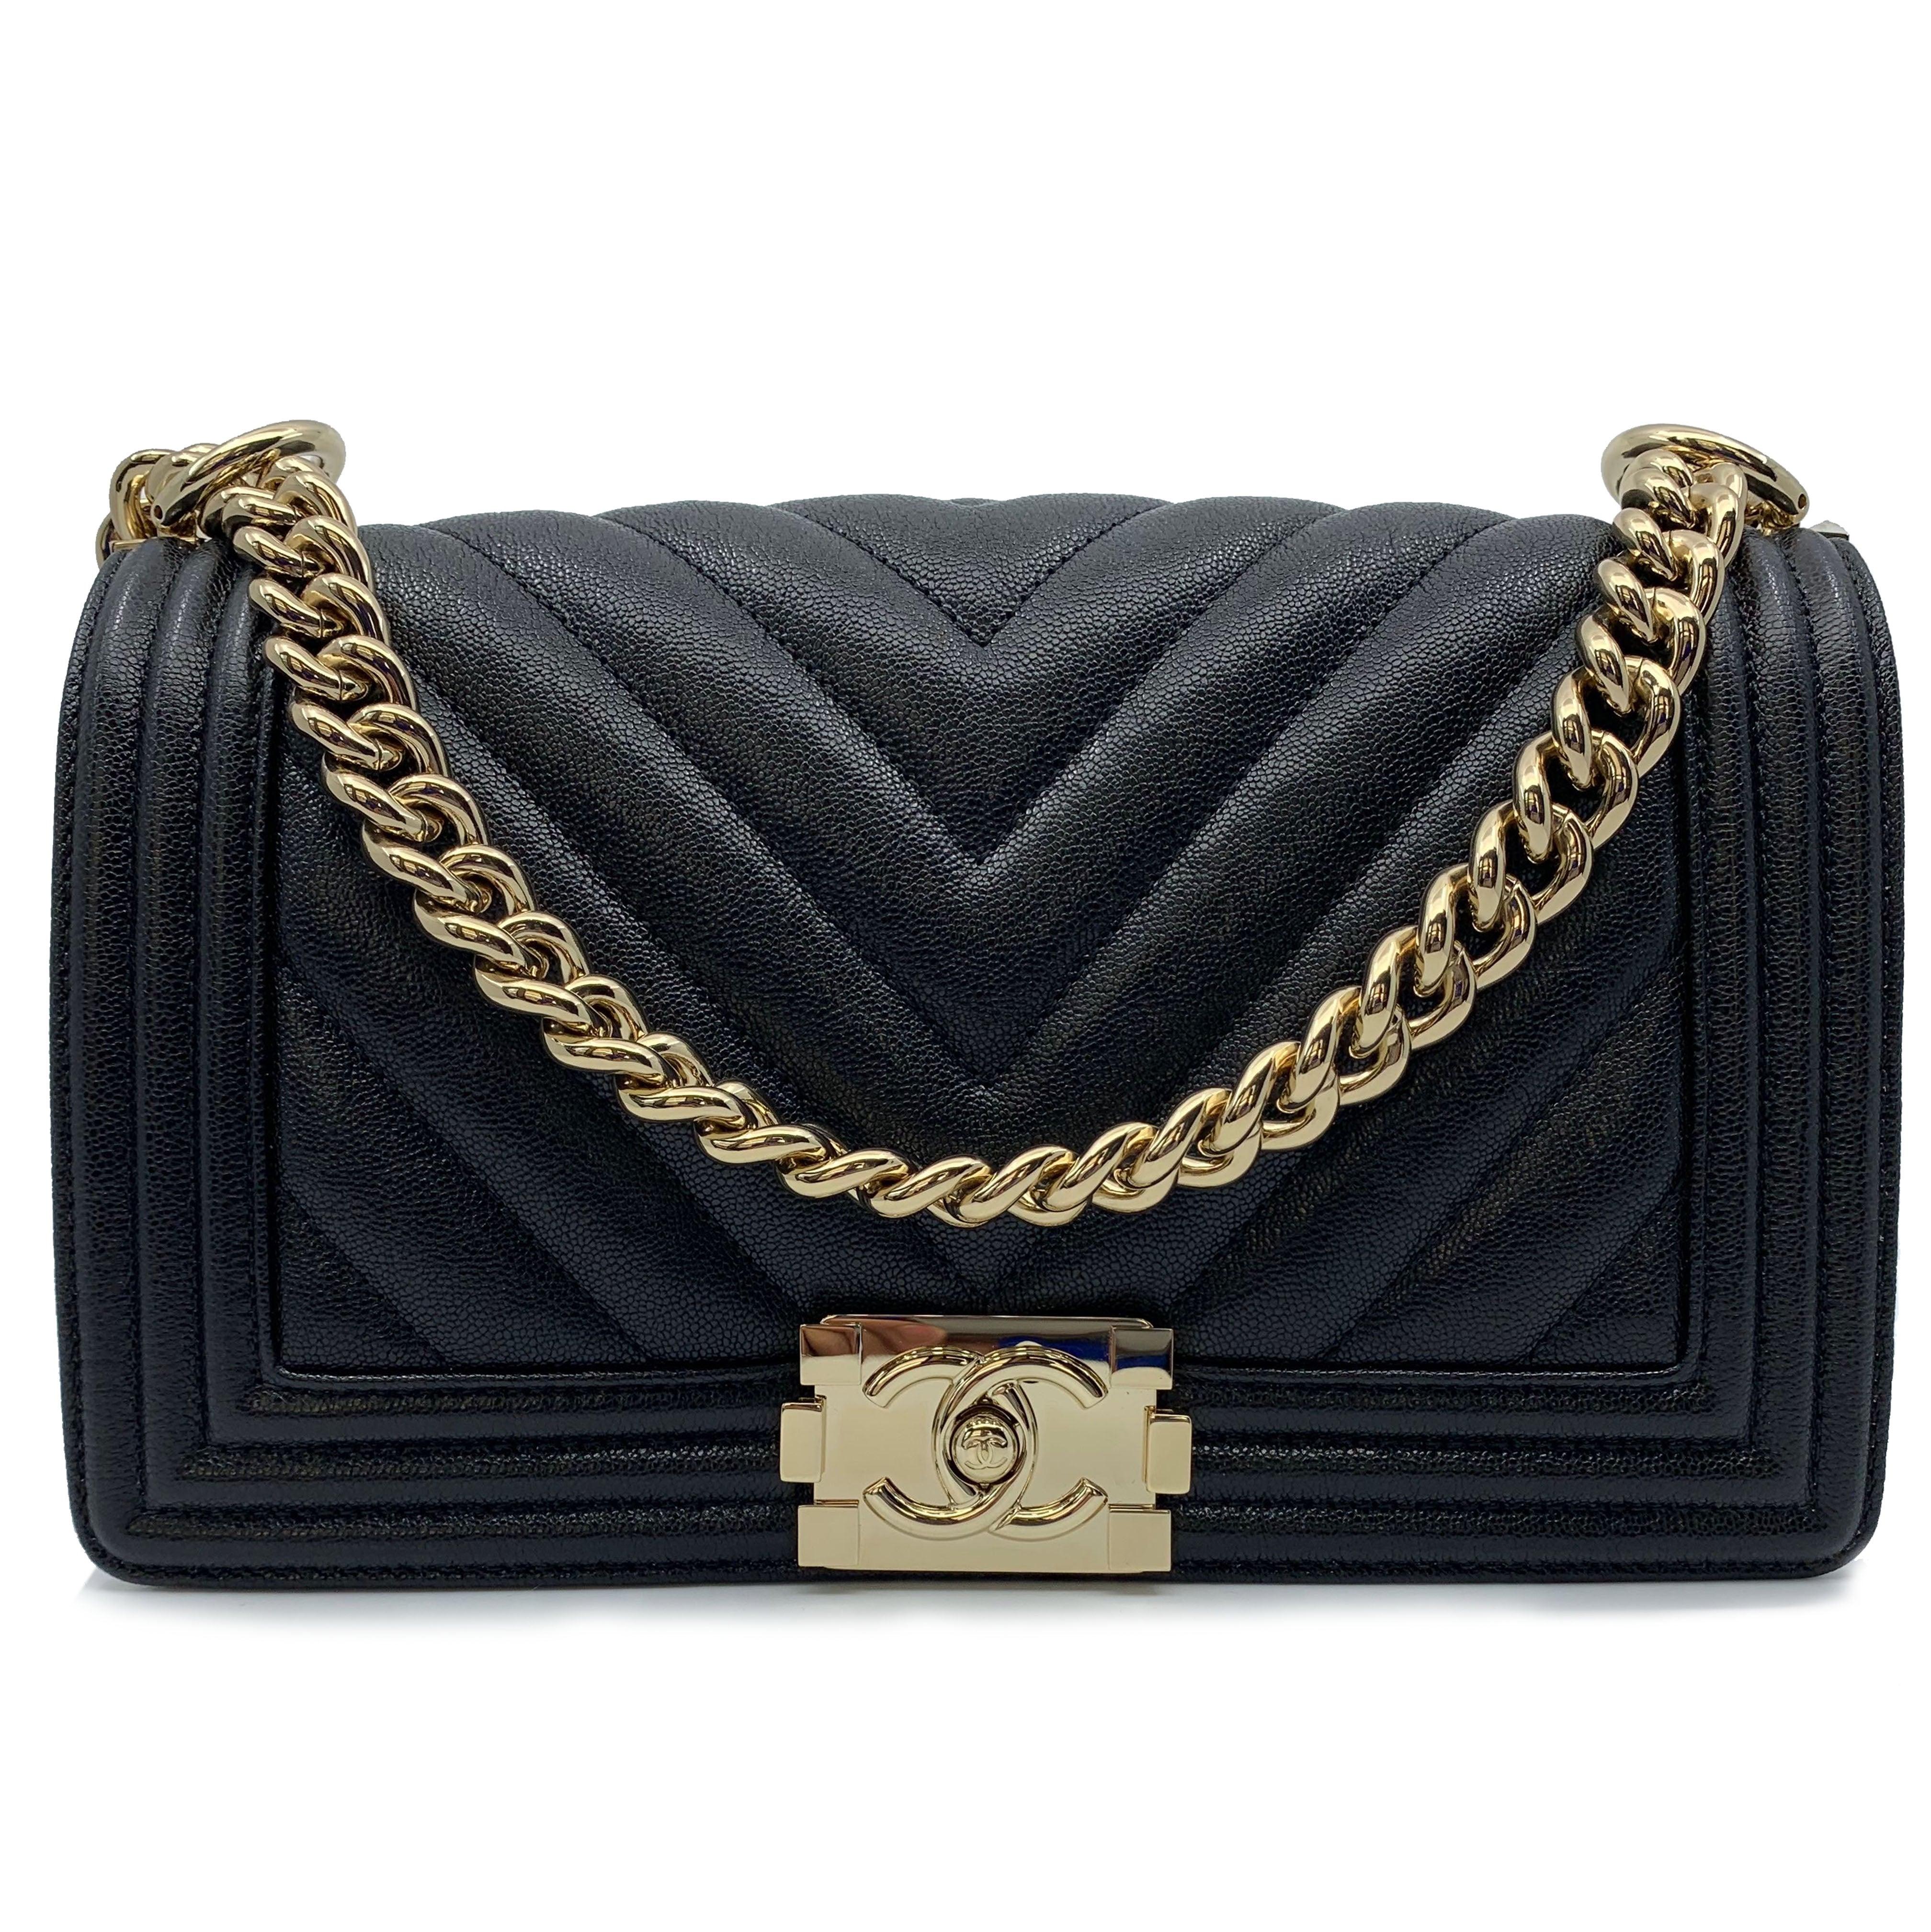 f02f87aab5f6 Chanel Caviar Chevron Quilted New Medium Boy Flap Black A67086 For Sale at  1stdibs